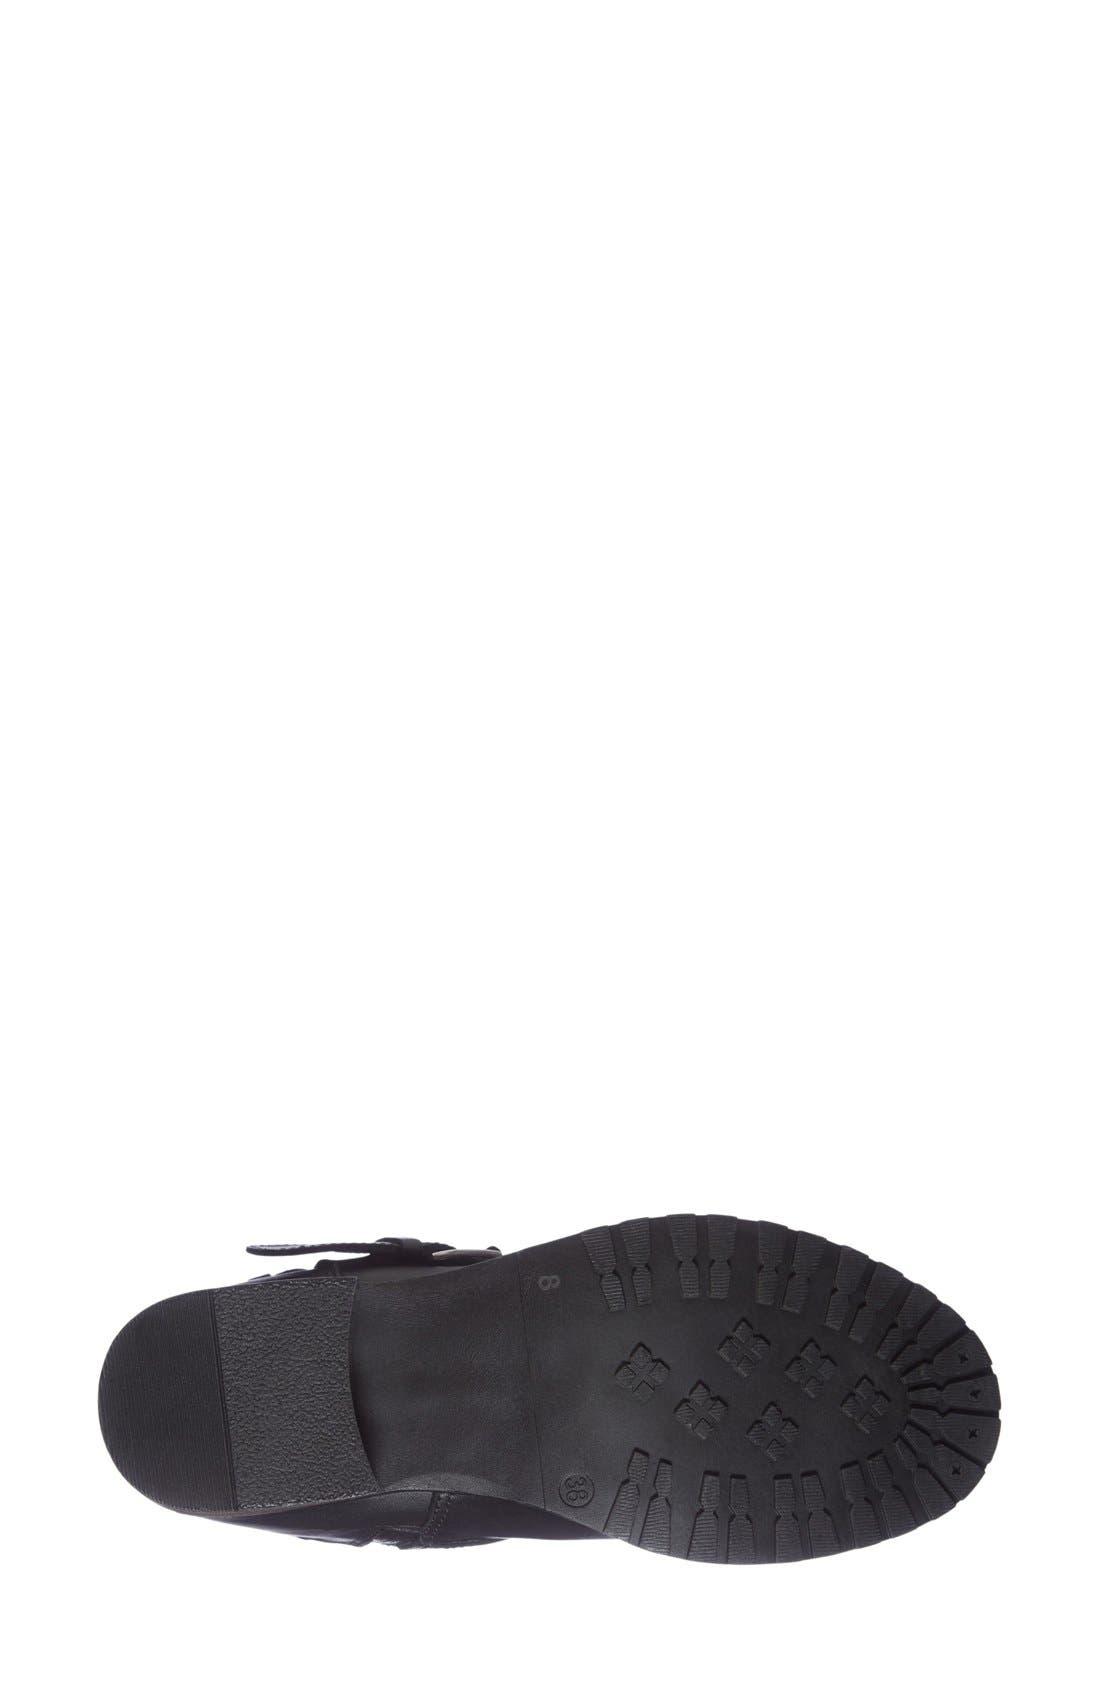 'Granada' Waterproof Pyramid Studded Boot,                             Alternate thumbnail 4, color,                             Black